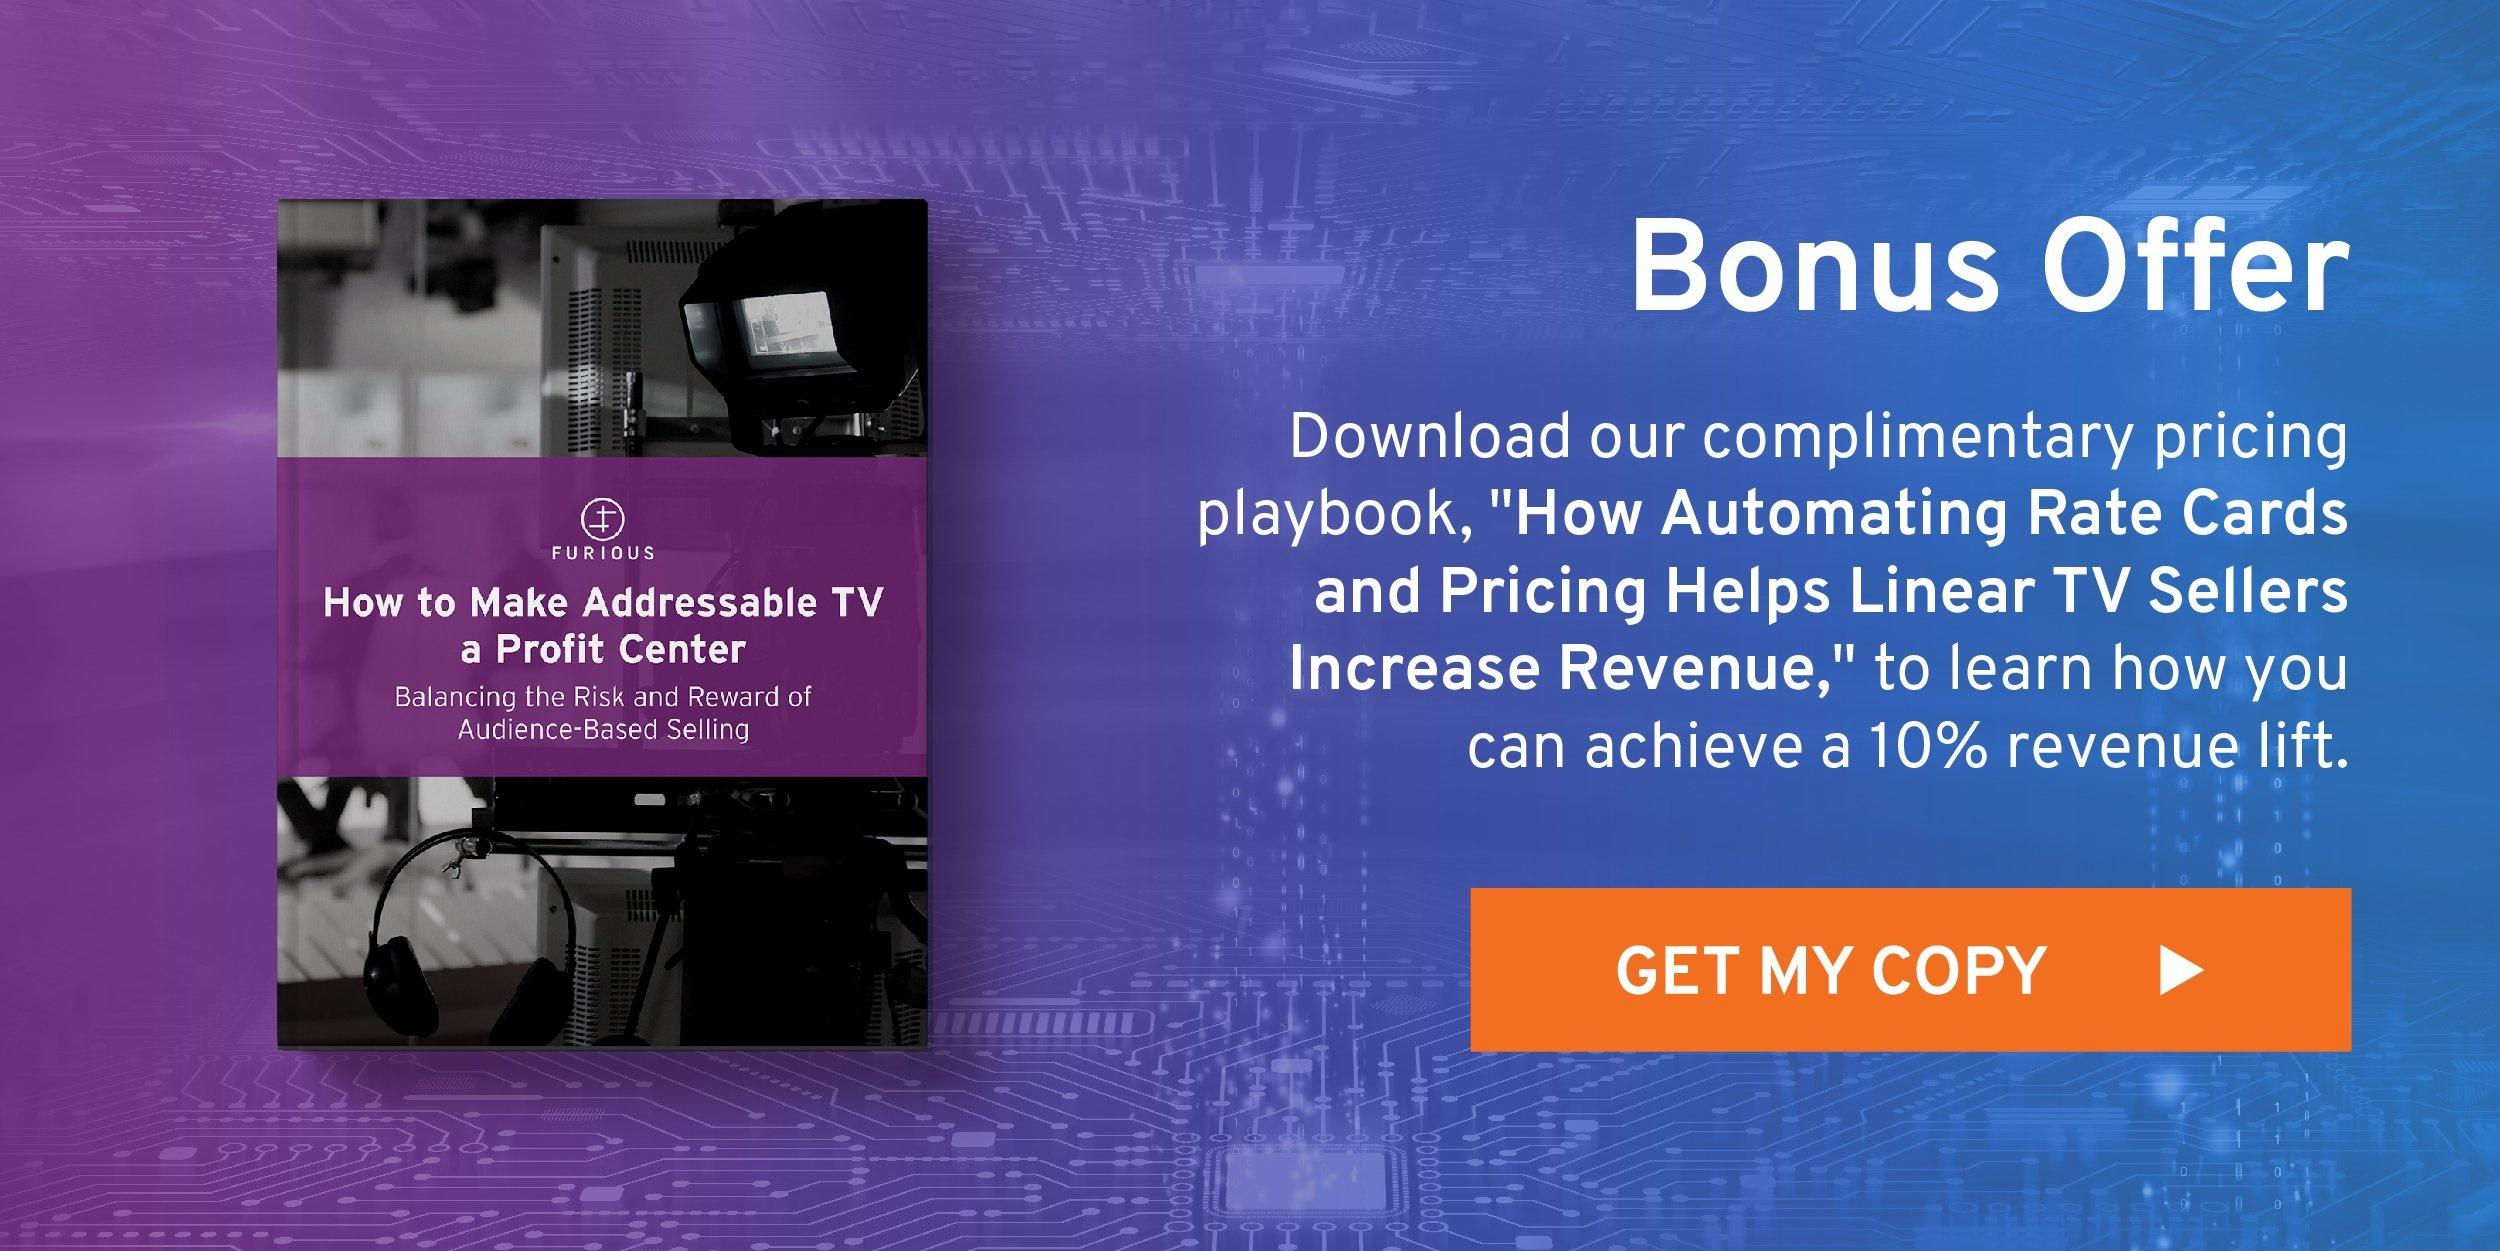 Pricing Playbook